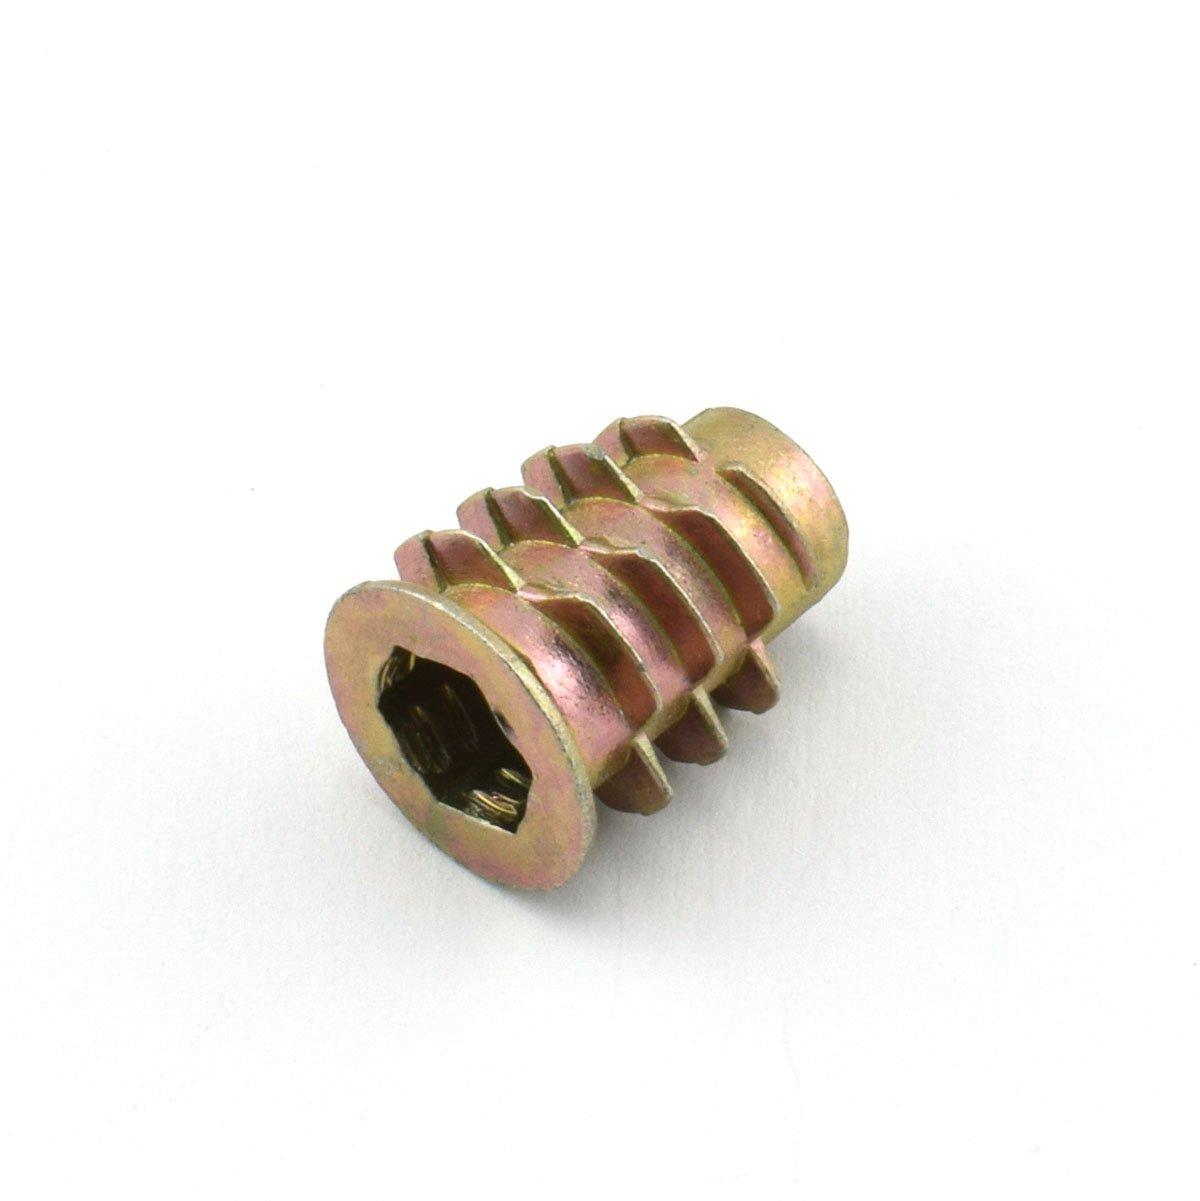 LQ Industrial 12pcs 15mm Furniture Screw-in Nut Zinc Alloy Bolt Fastener Connector Hex Socket Drive Threaded Insert Nuts For Wood Furniture Assortment 1//4-20